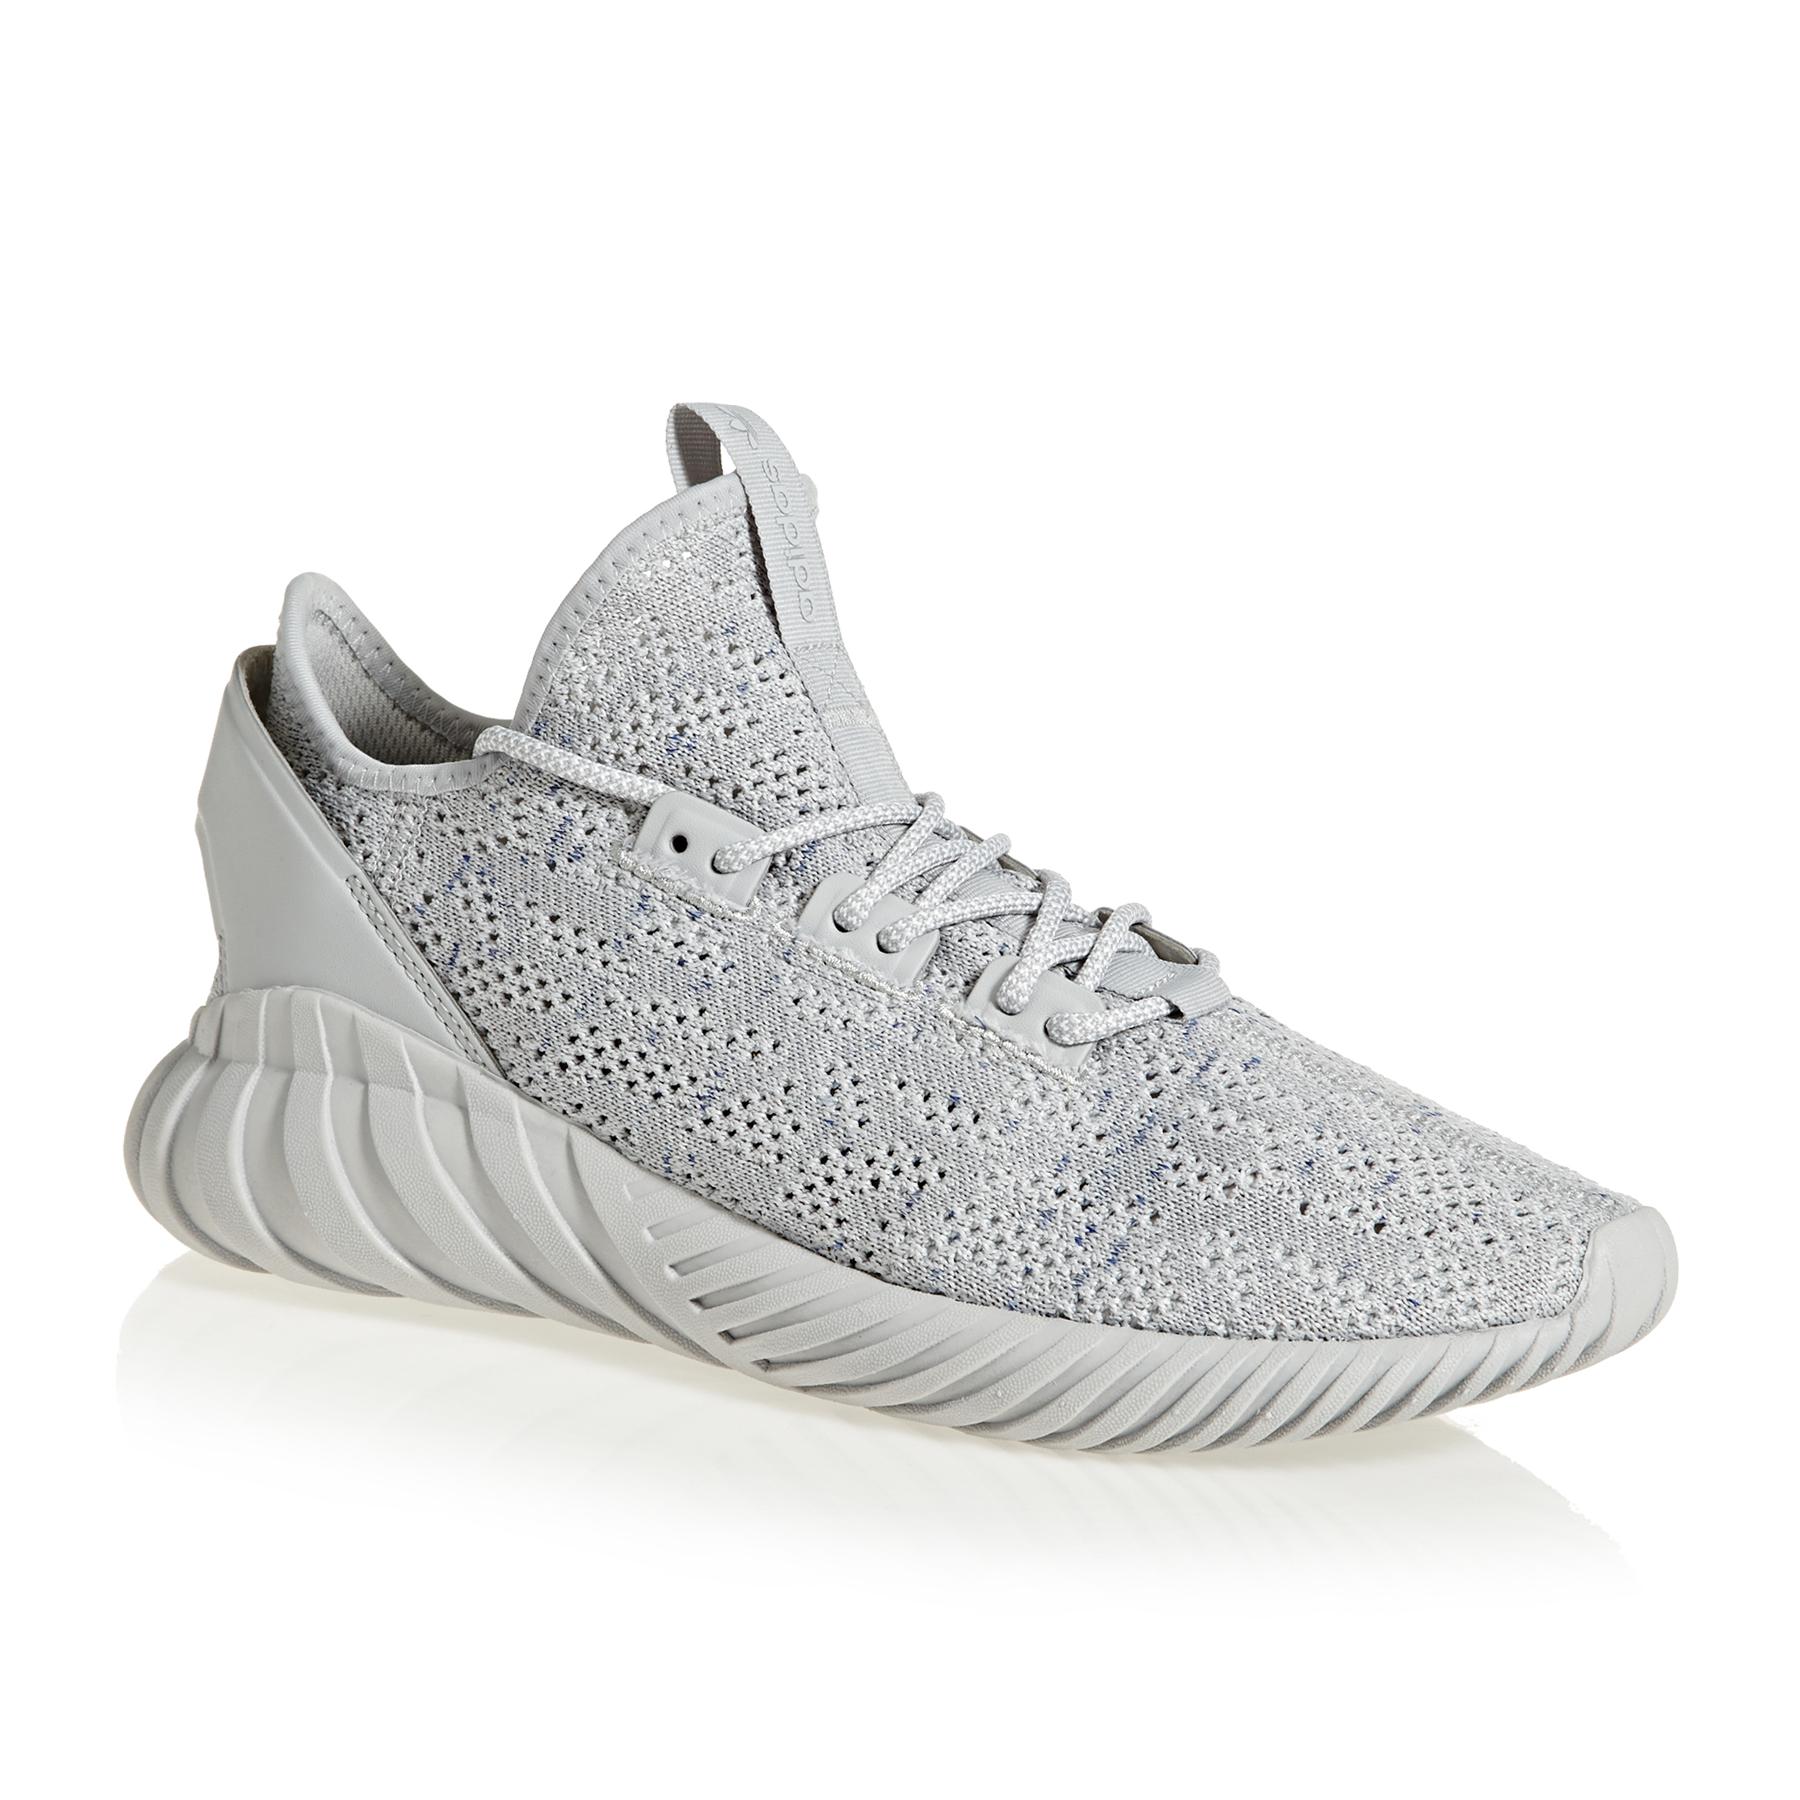 Adidas Originals Tubular Doom Sock Primeknit Schuhe Neu